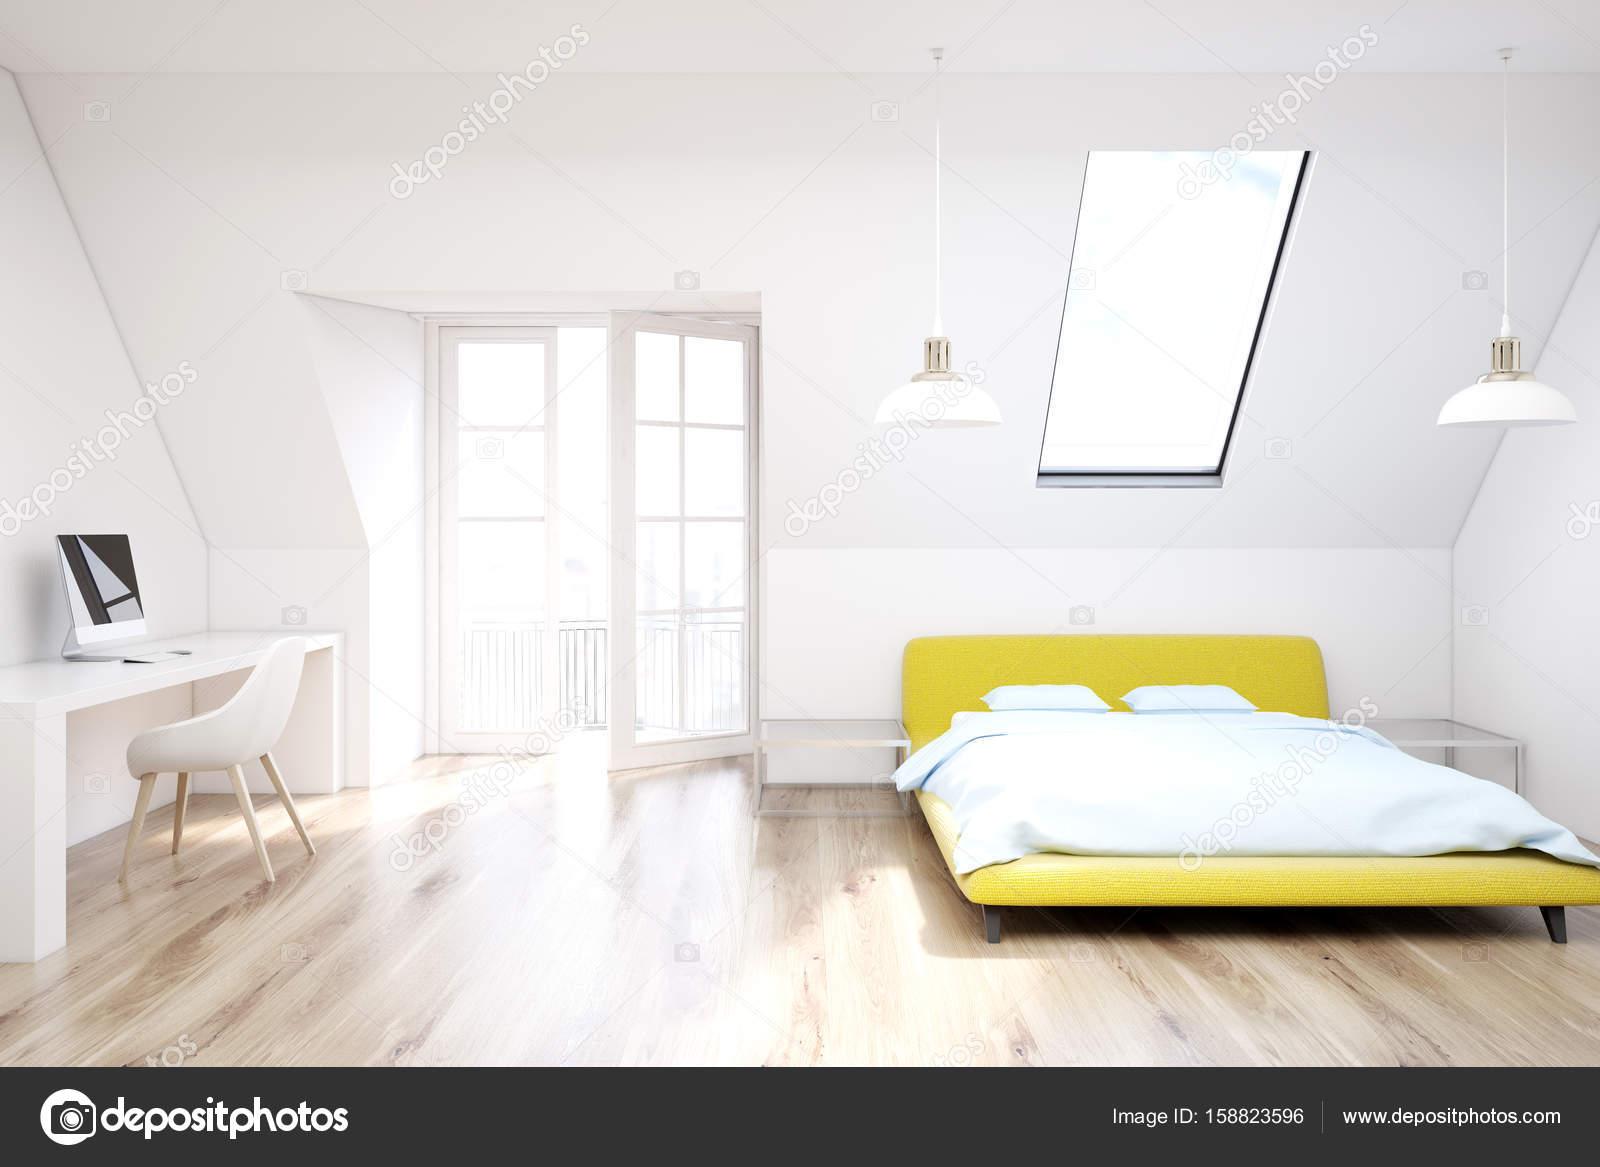 Slaapkamer Houten Vloer : Witte houten vloer zolder slaapkamer geel u stockfoto